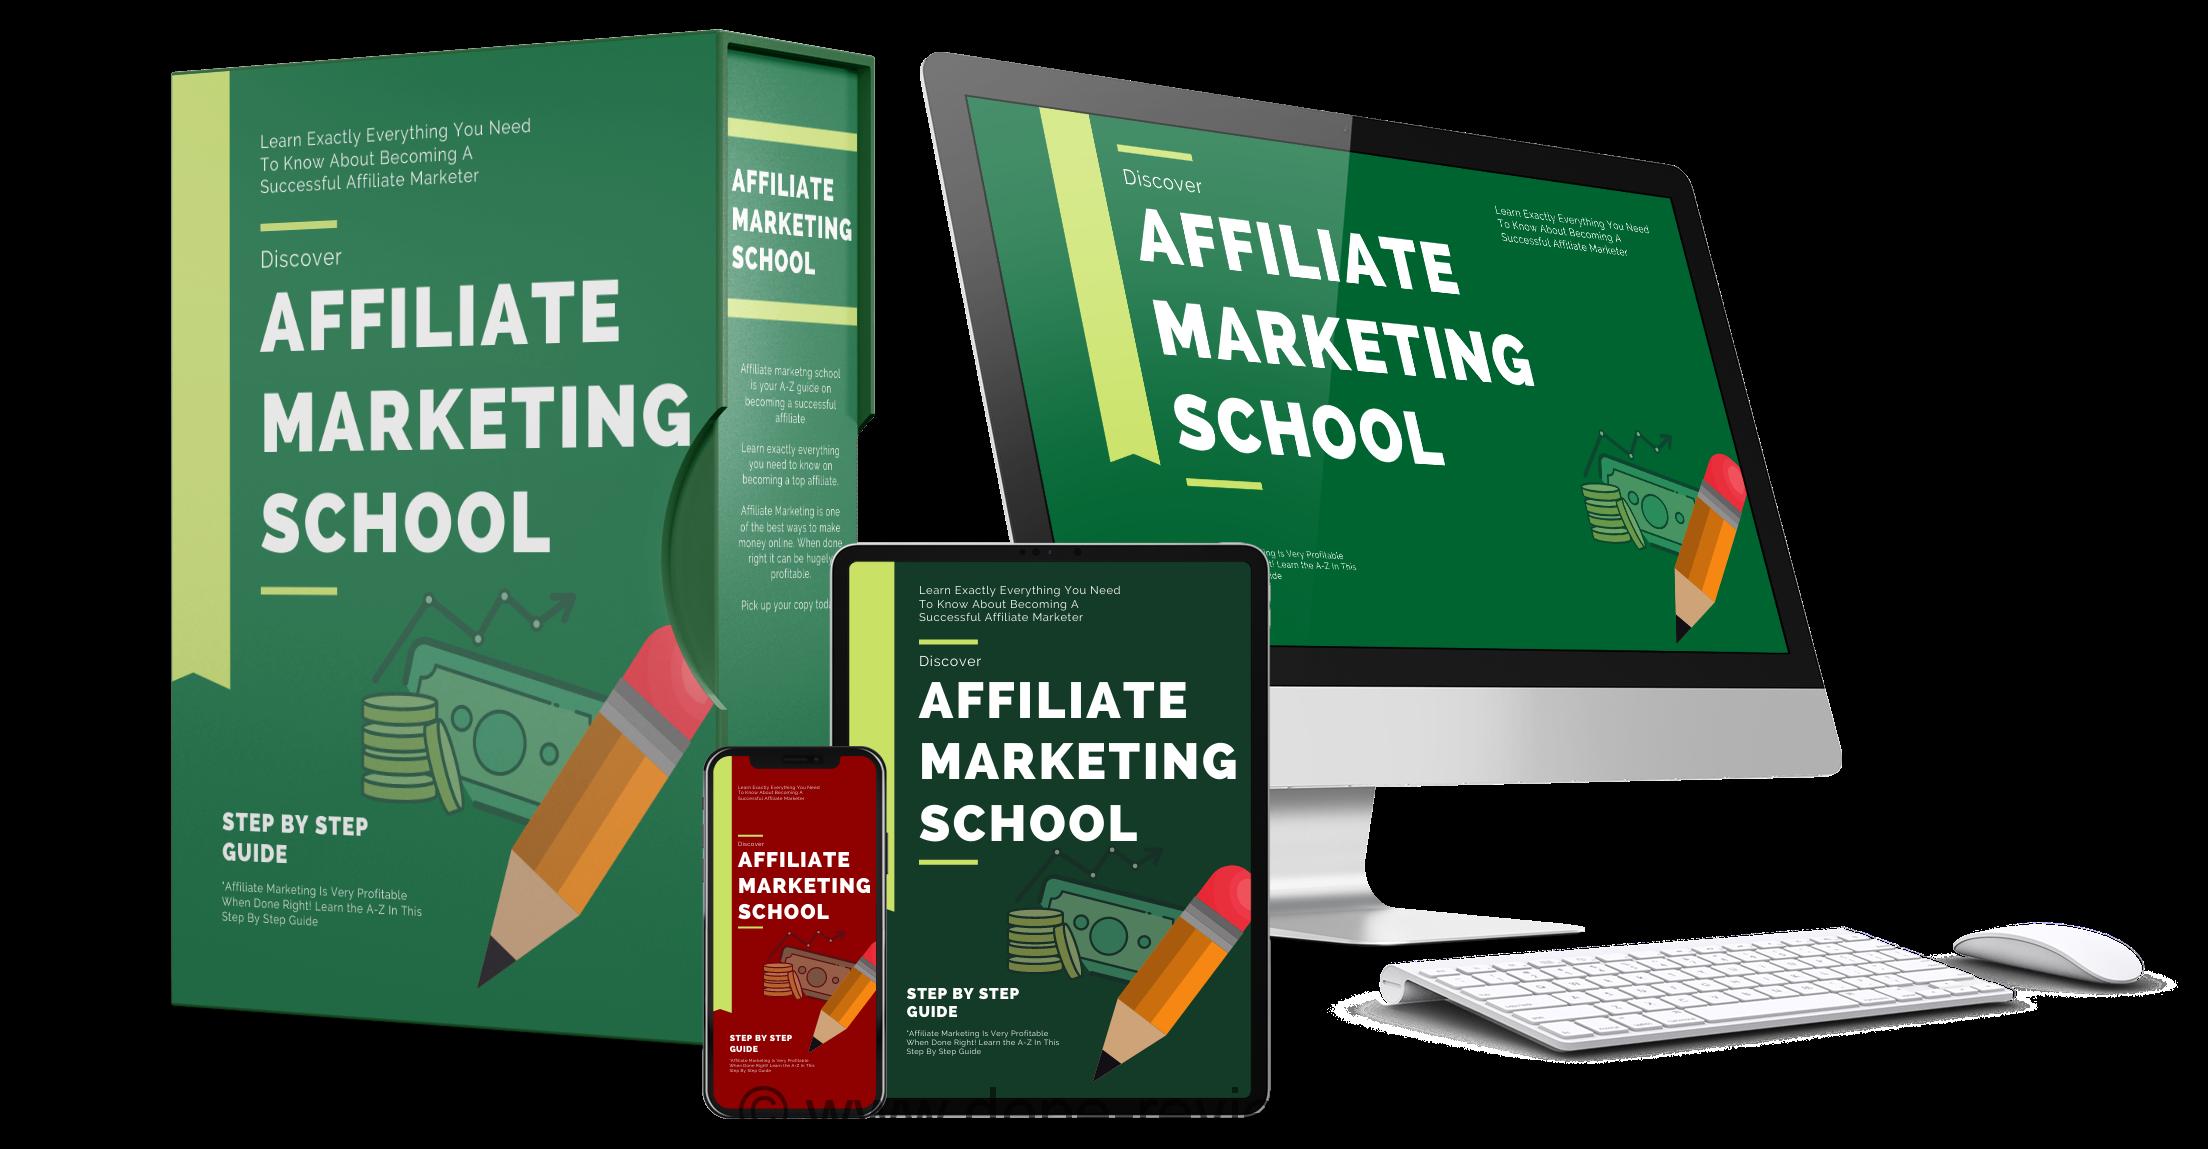 Affiliate Marketing School Review